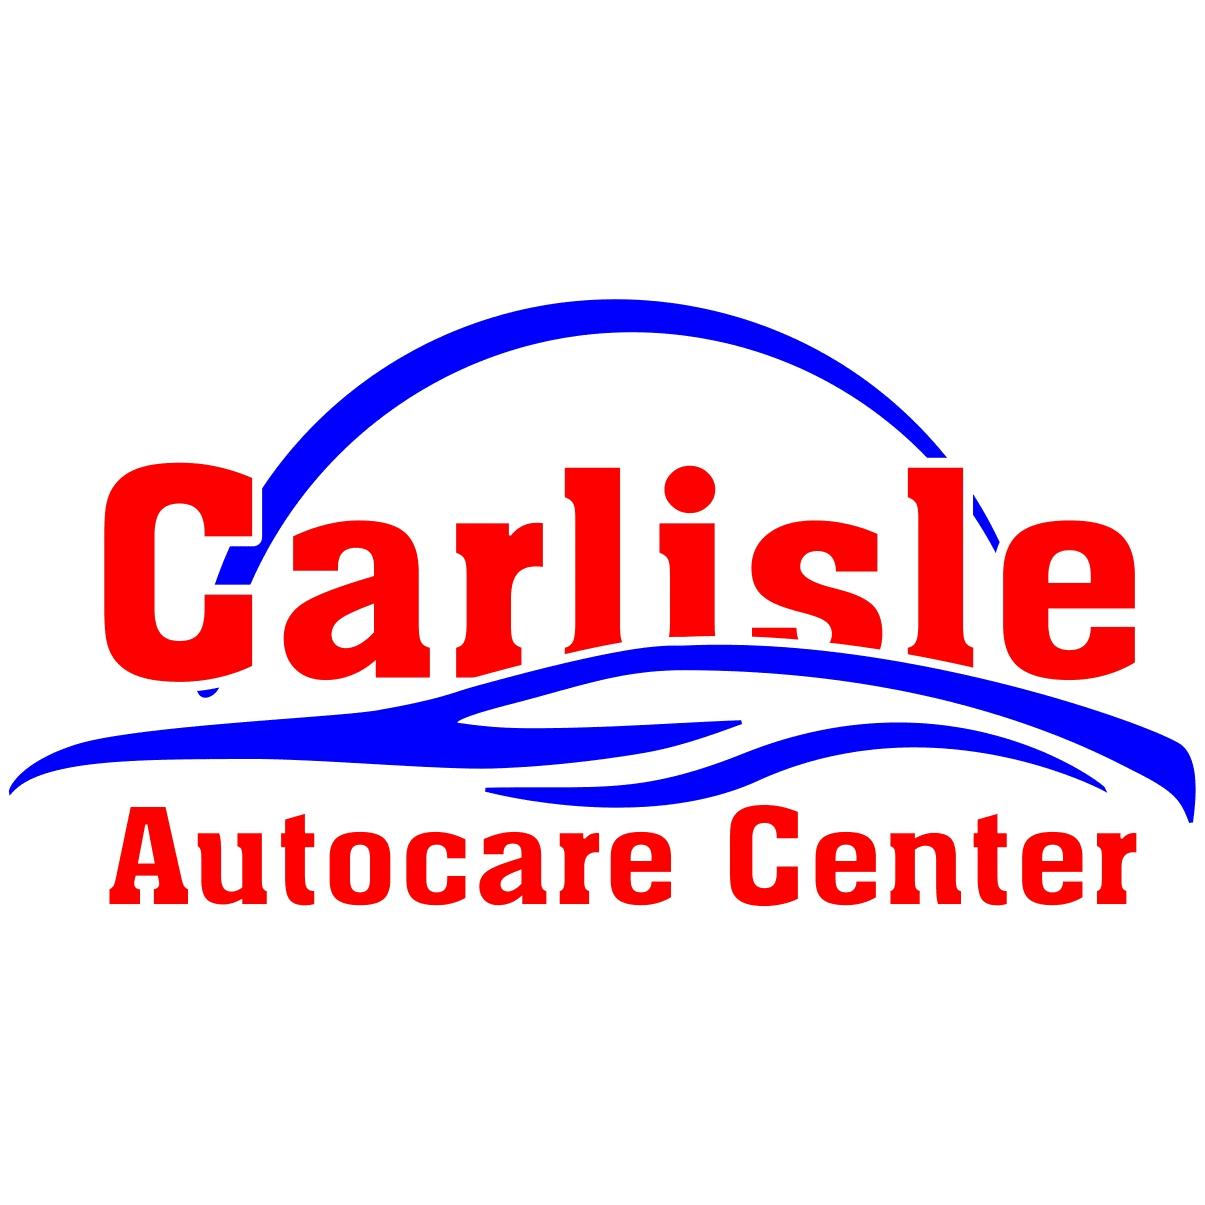 Carlisle Auto Care Center